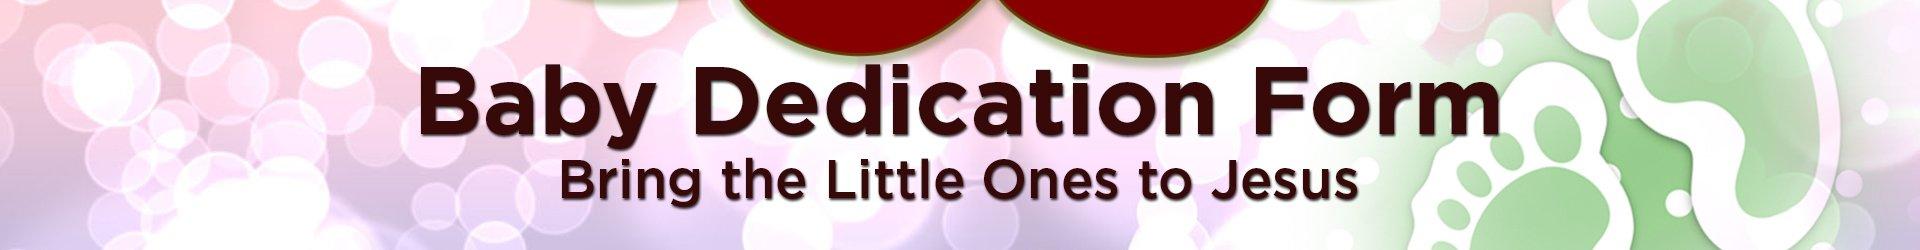 Baby Dedication Form graphic